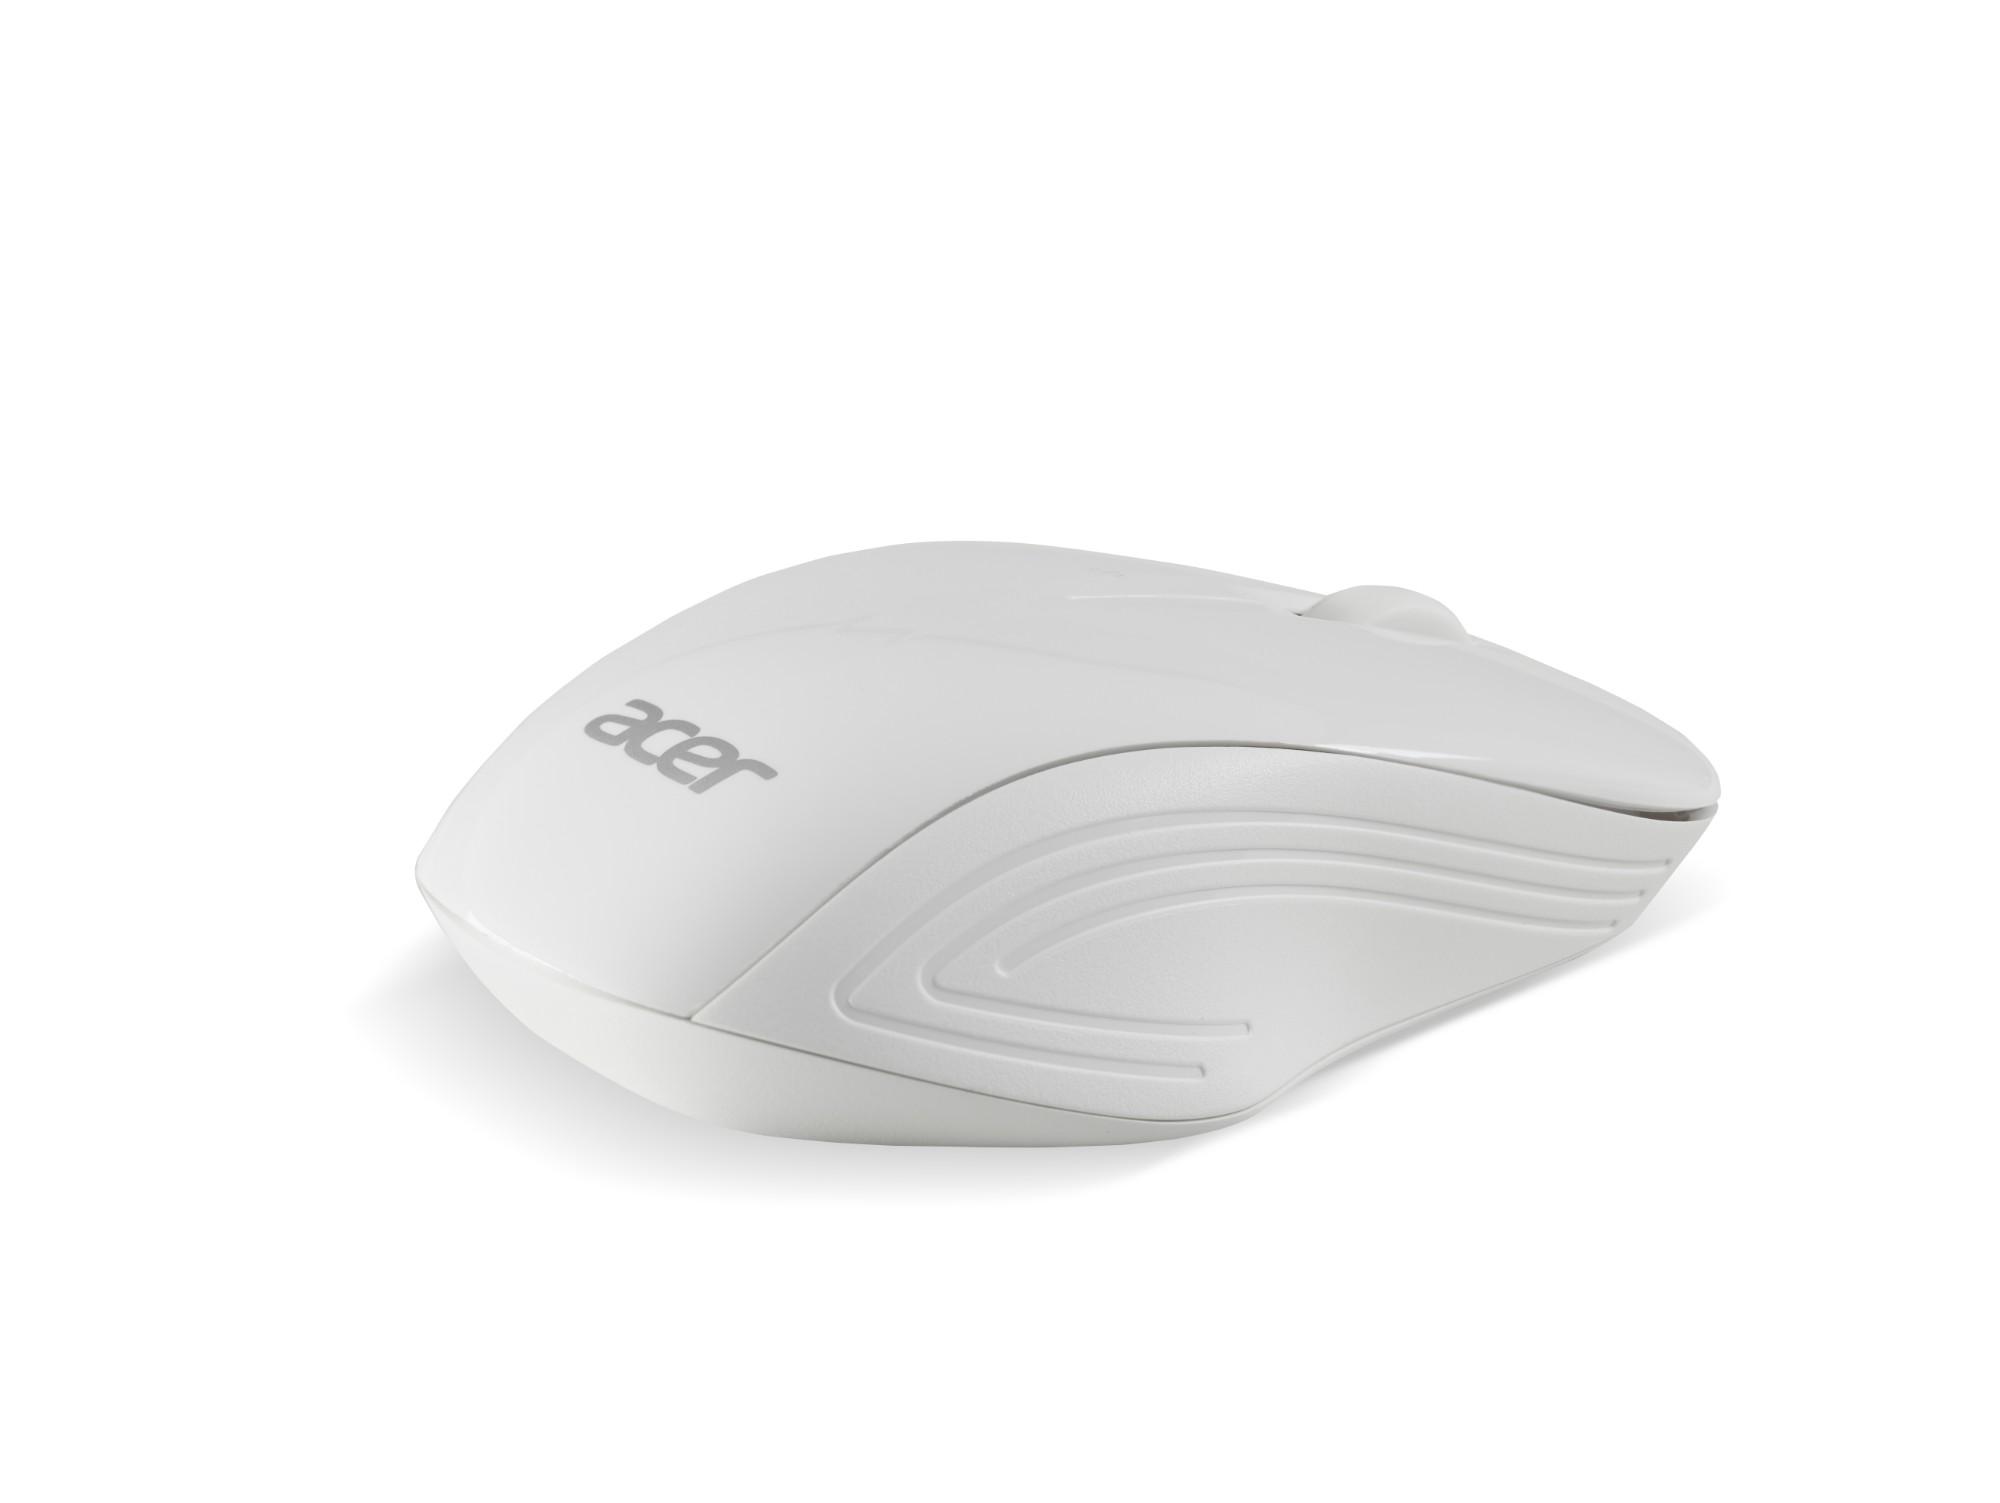 Acer AMR510 mice RF Wireless Optical 1000 DPI Ambidextrous White